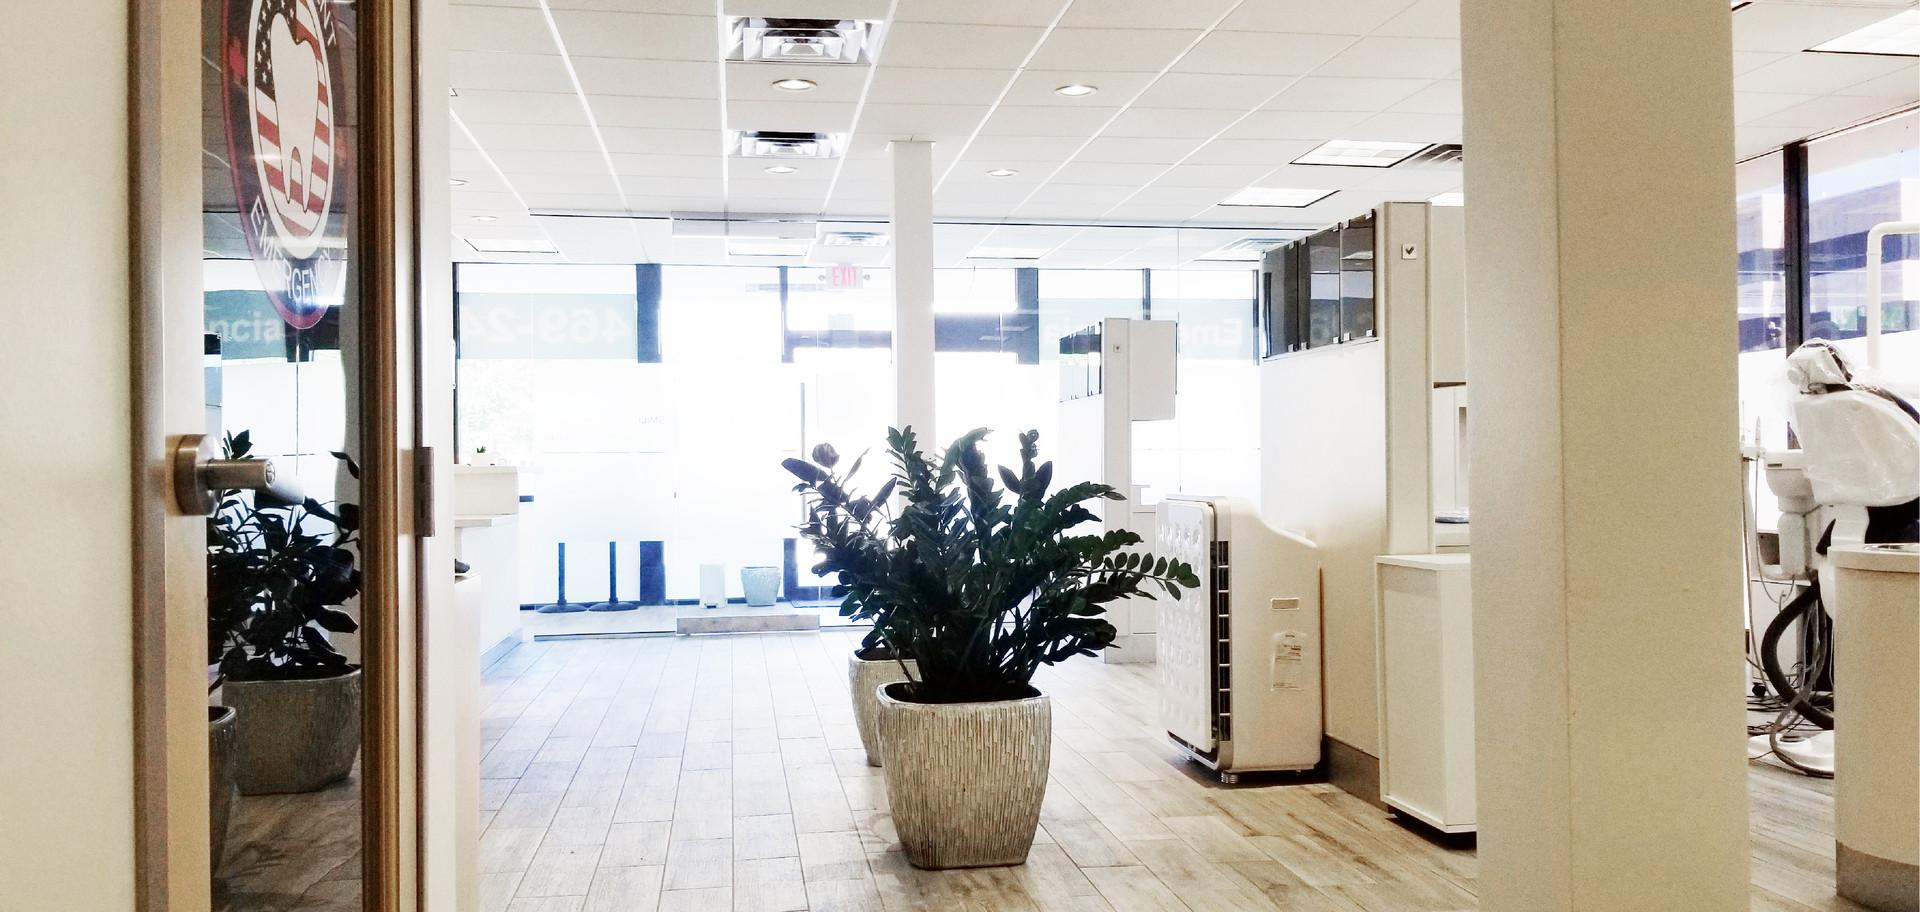 DentUrgent Office Photo (1).jpg